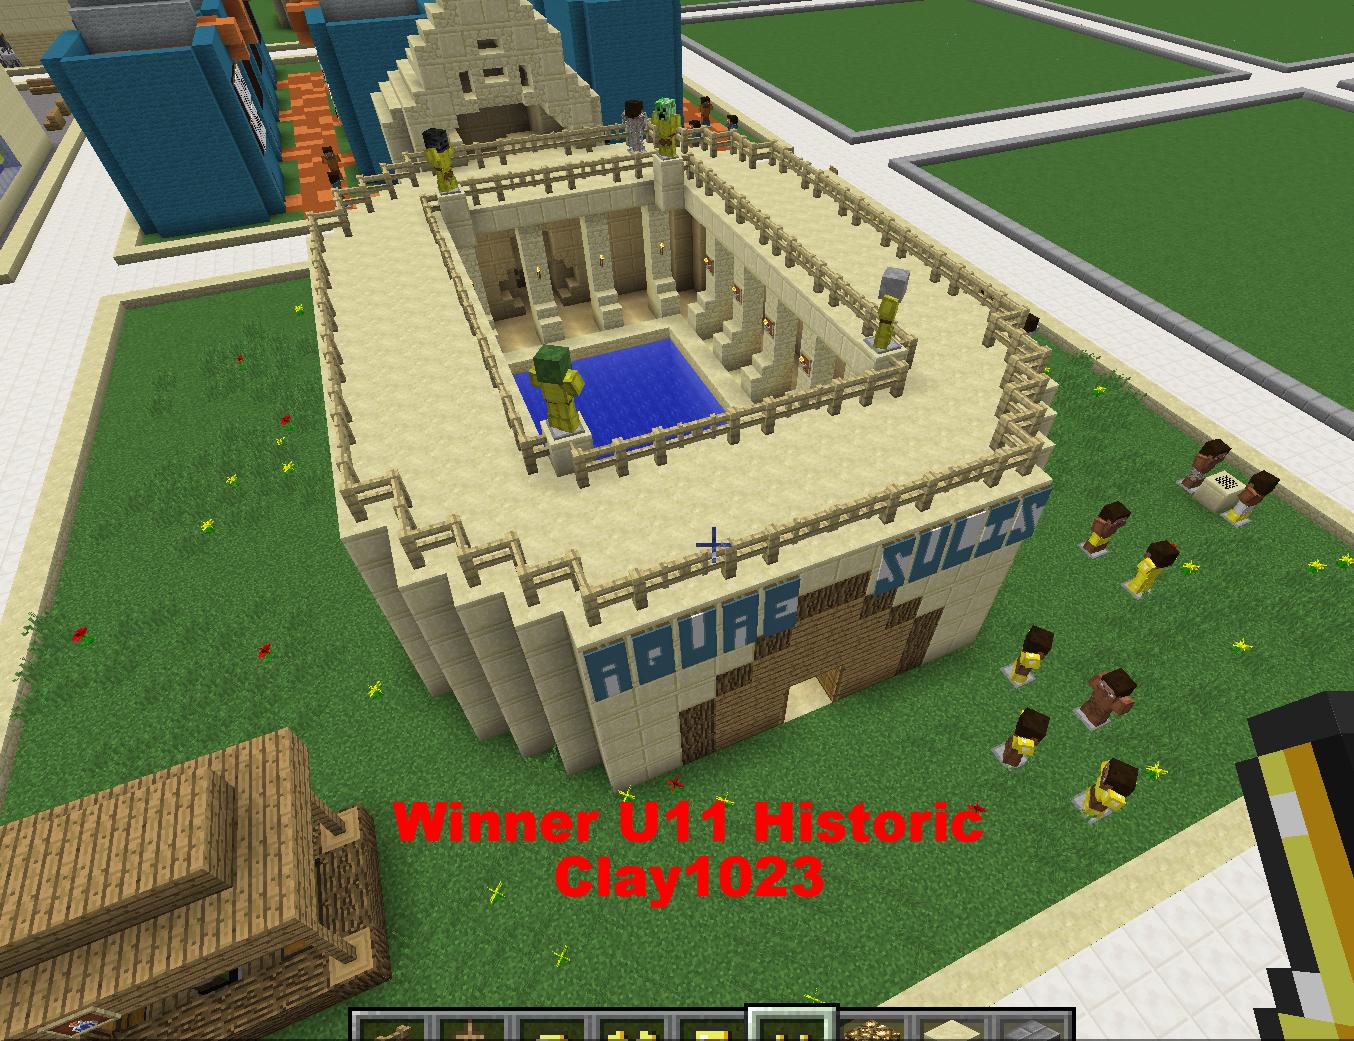 Winner U11 Historic - Clay1023